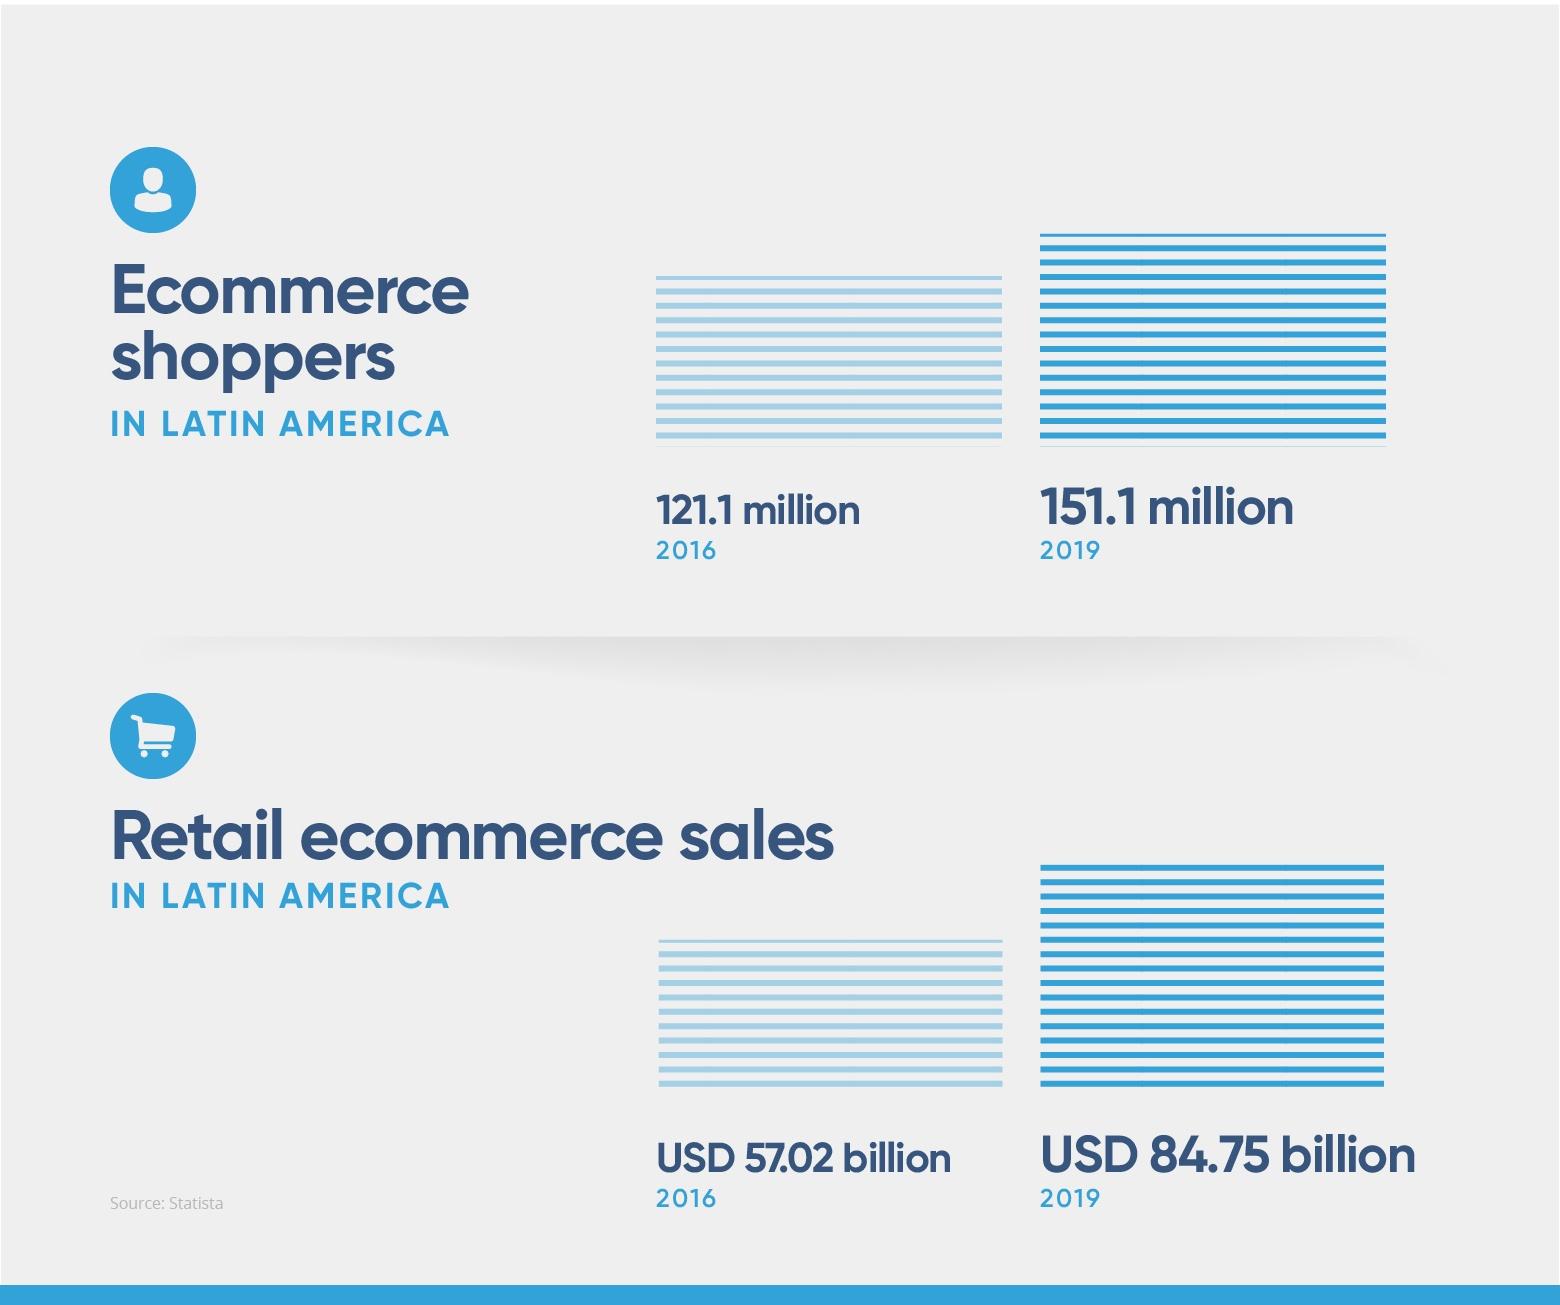 ecommerce-in-latin-america-ecommerce-in-latam-2x-1.jpg